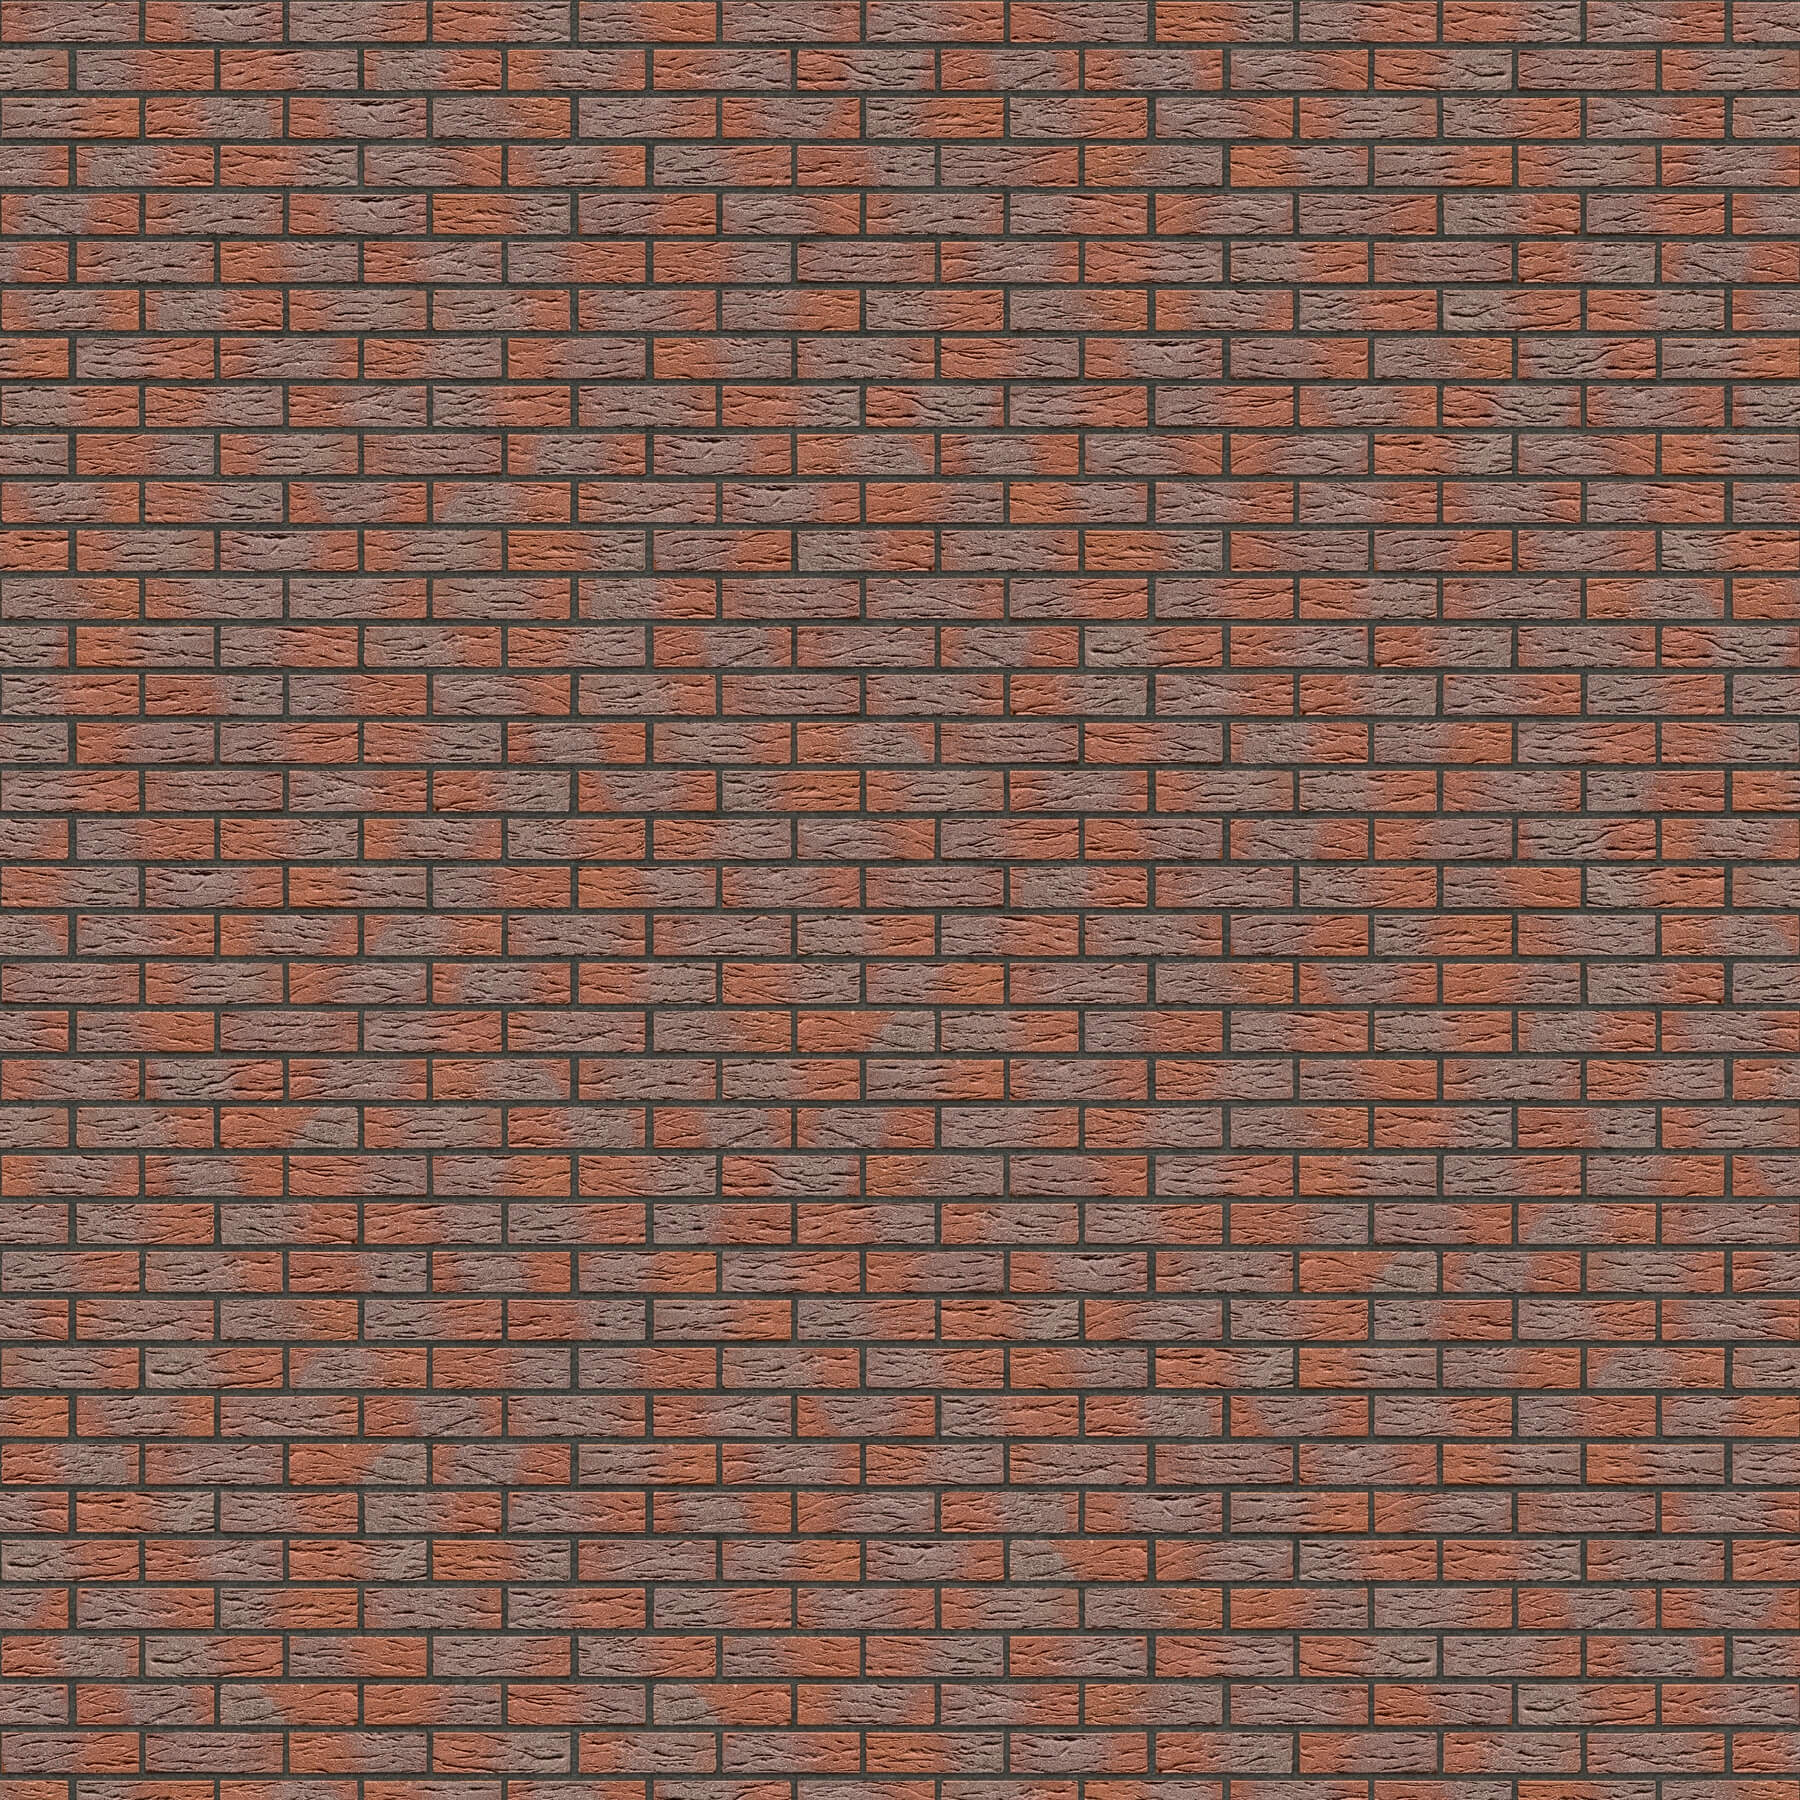 Puna-cigla-Feldhaus-Klinker-brick-house-nf-k-335-Antracit Fuga